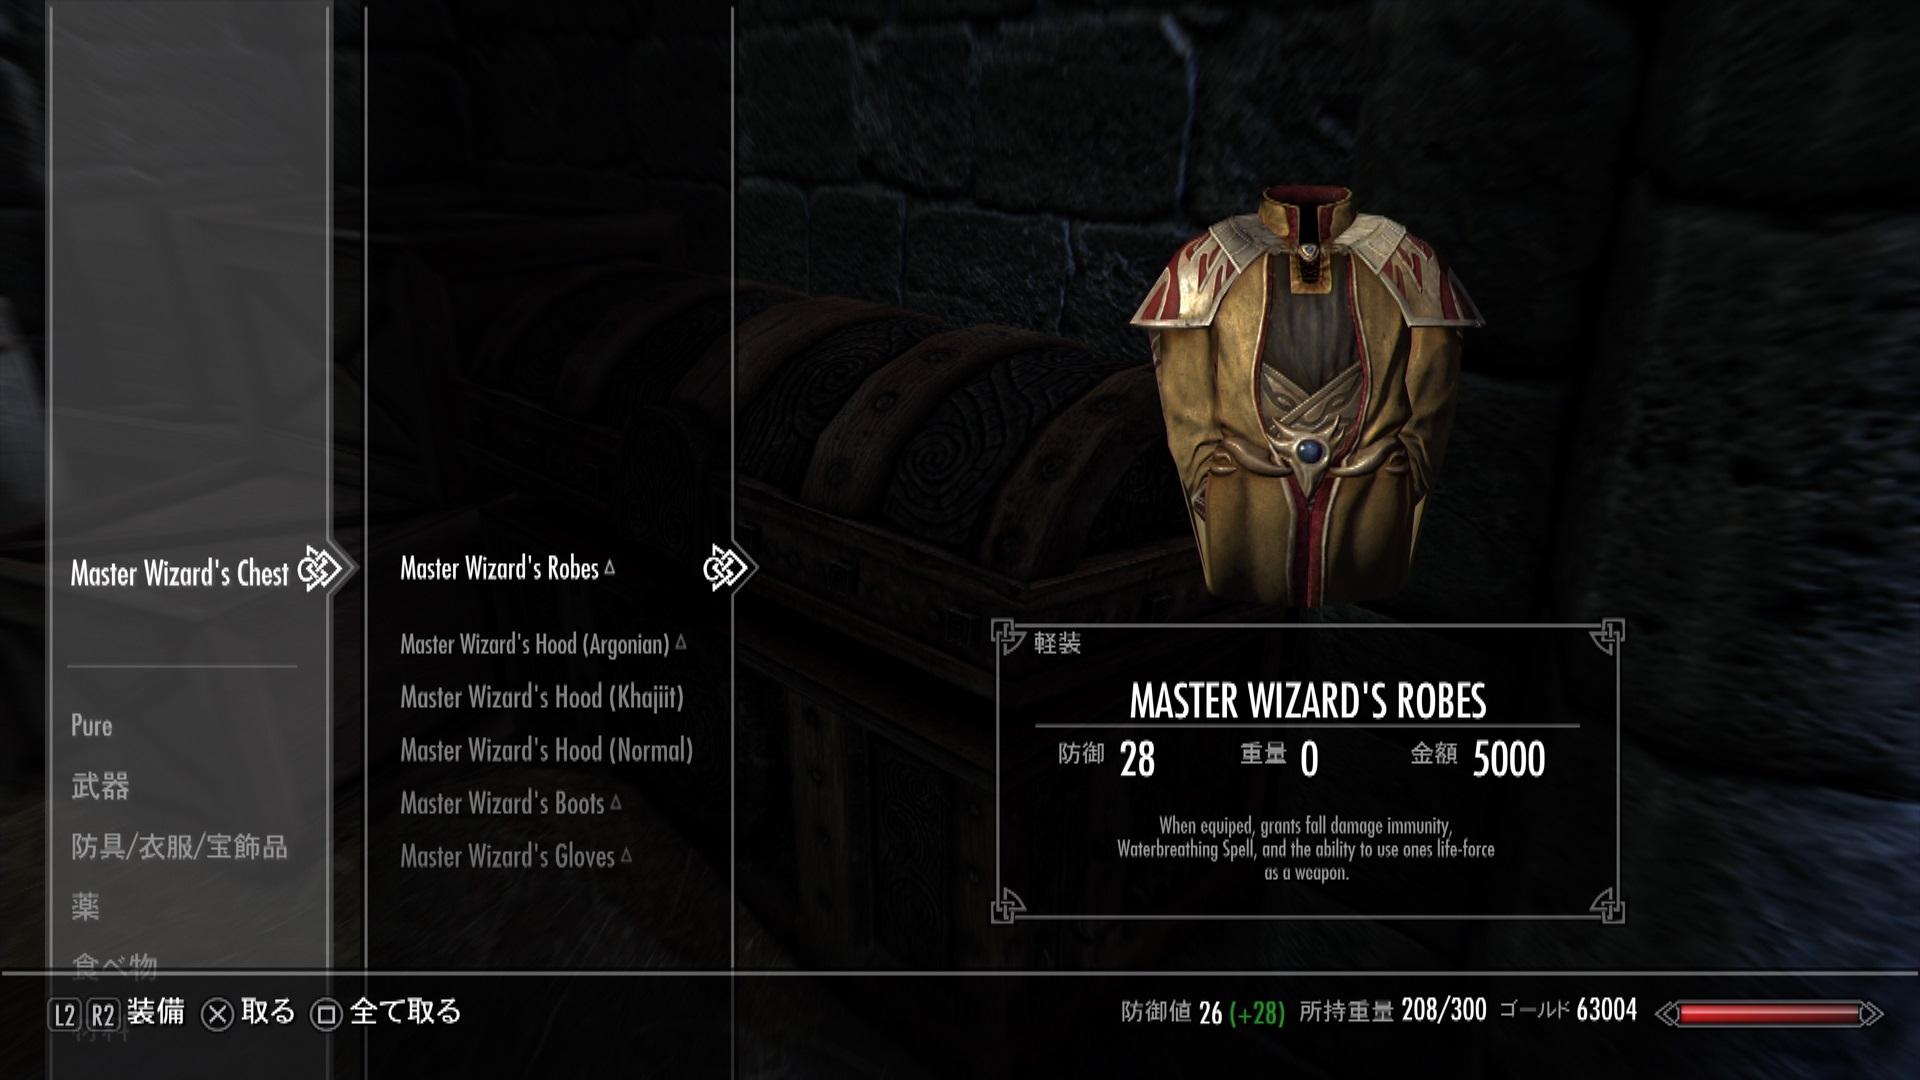 Master Wizard Gear - PS4 Edition - [PS4]Skyrim MOD